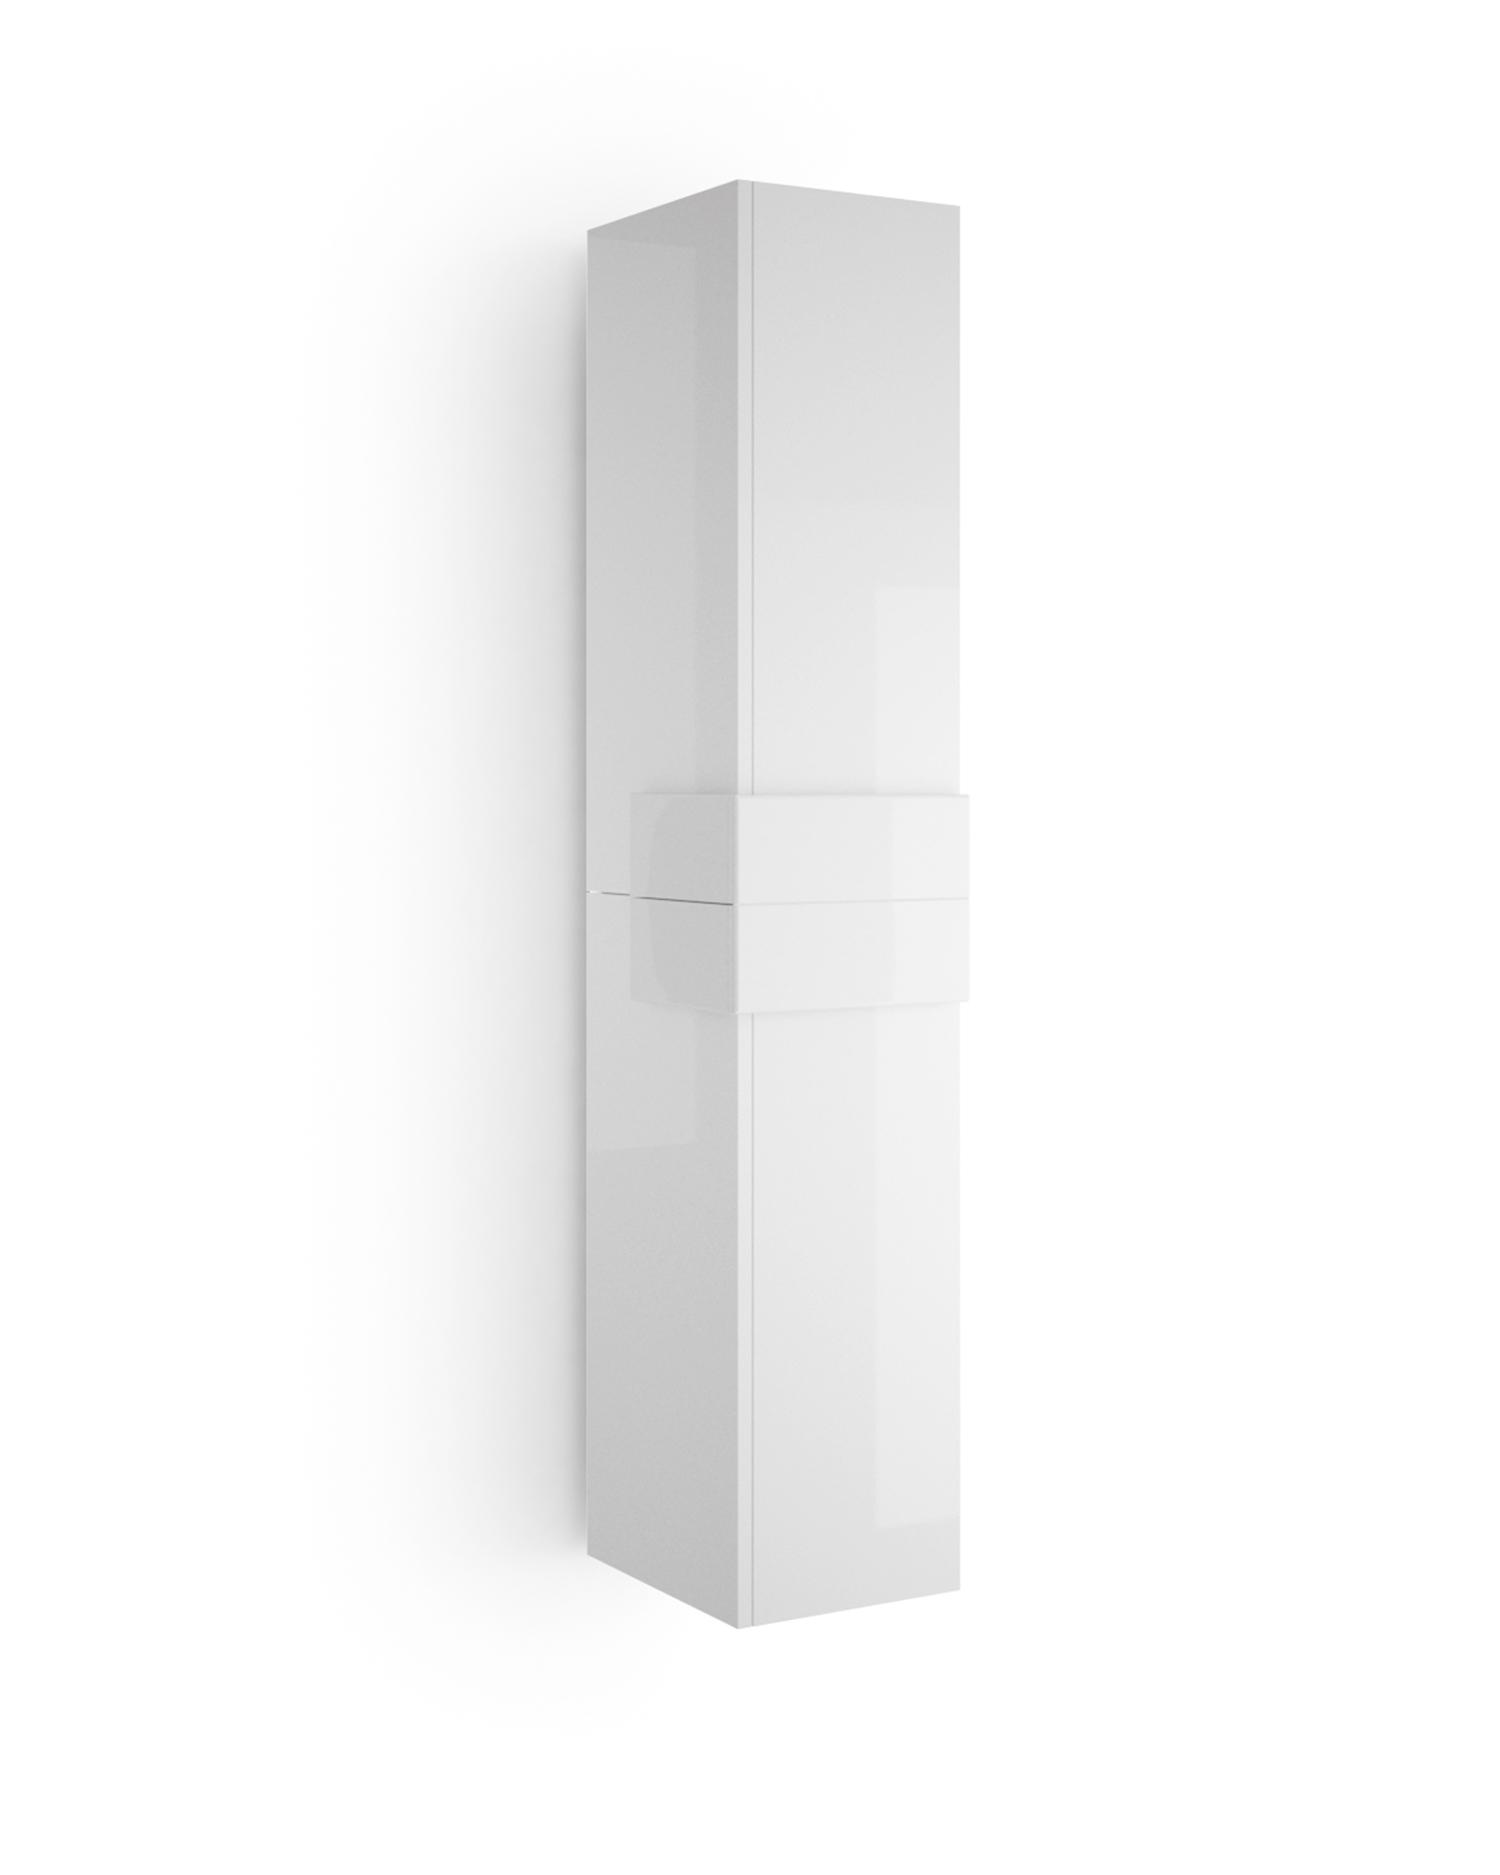 Muebles Cronos hoge kast 160cm wit - wit unieke afwerking